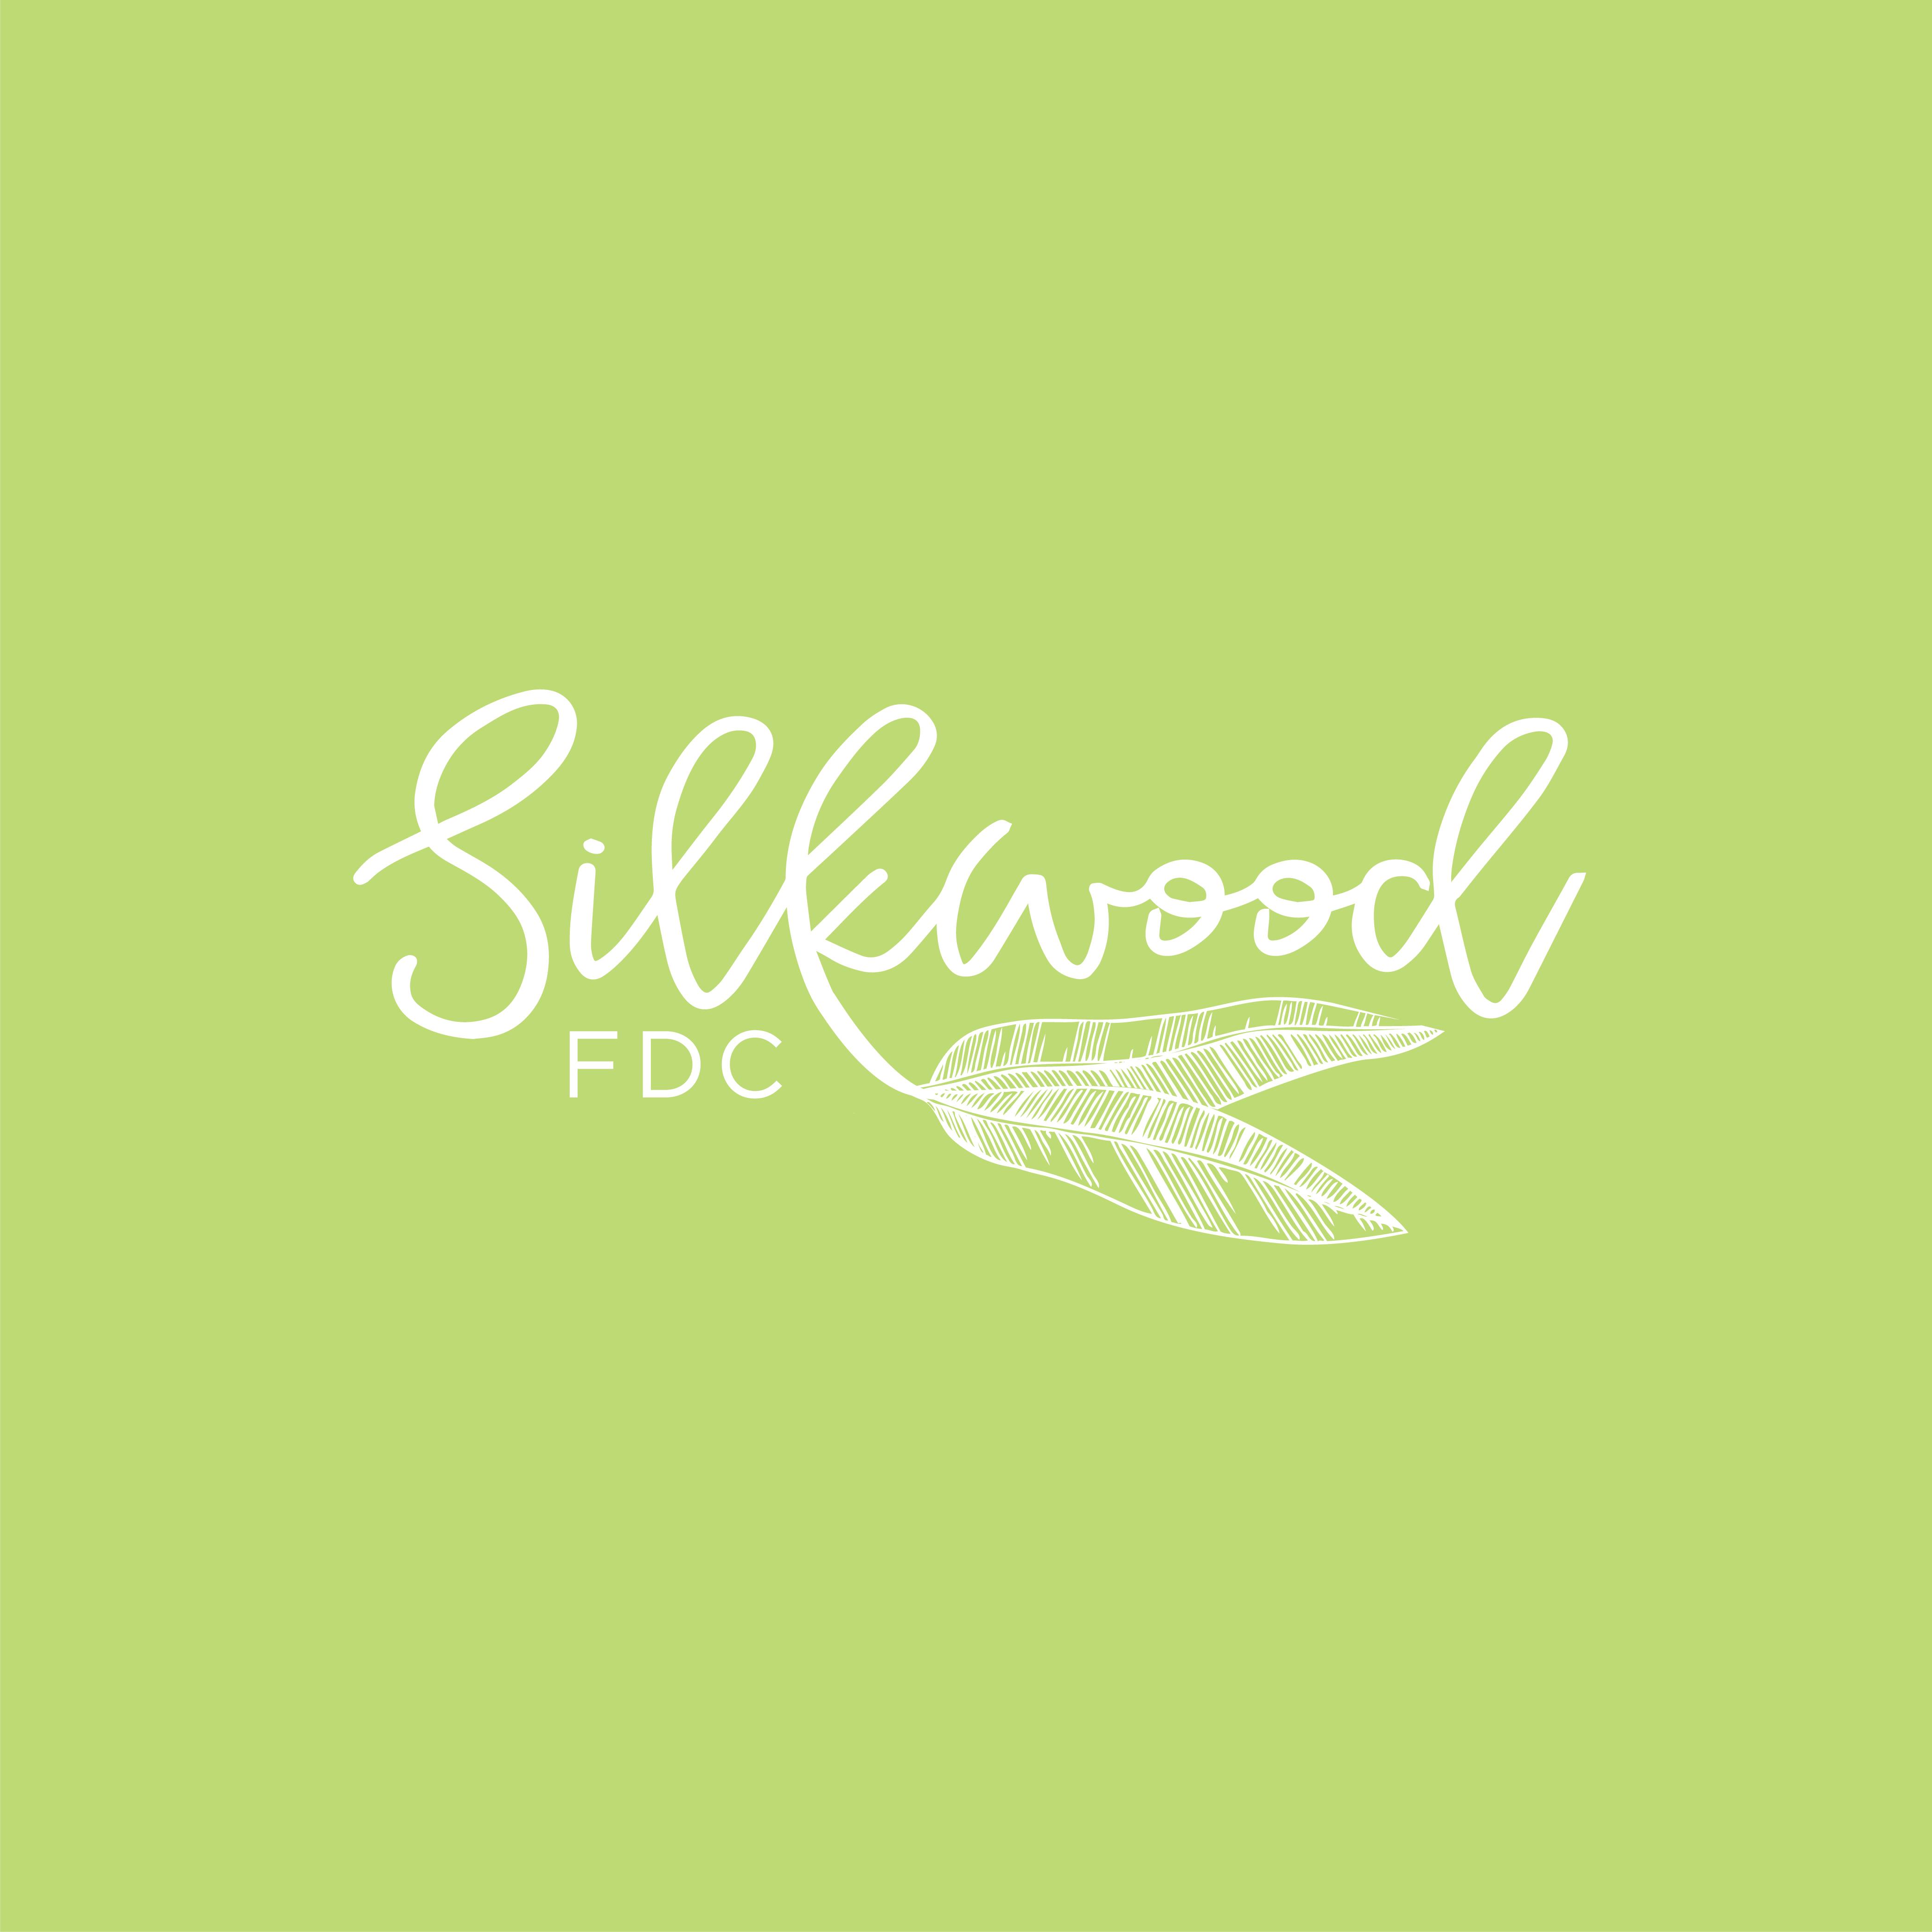 Silkwood FDC REVERSE